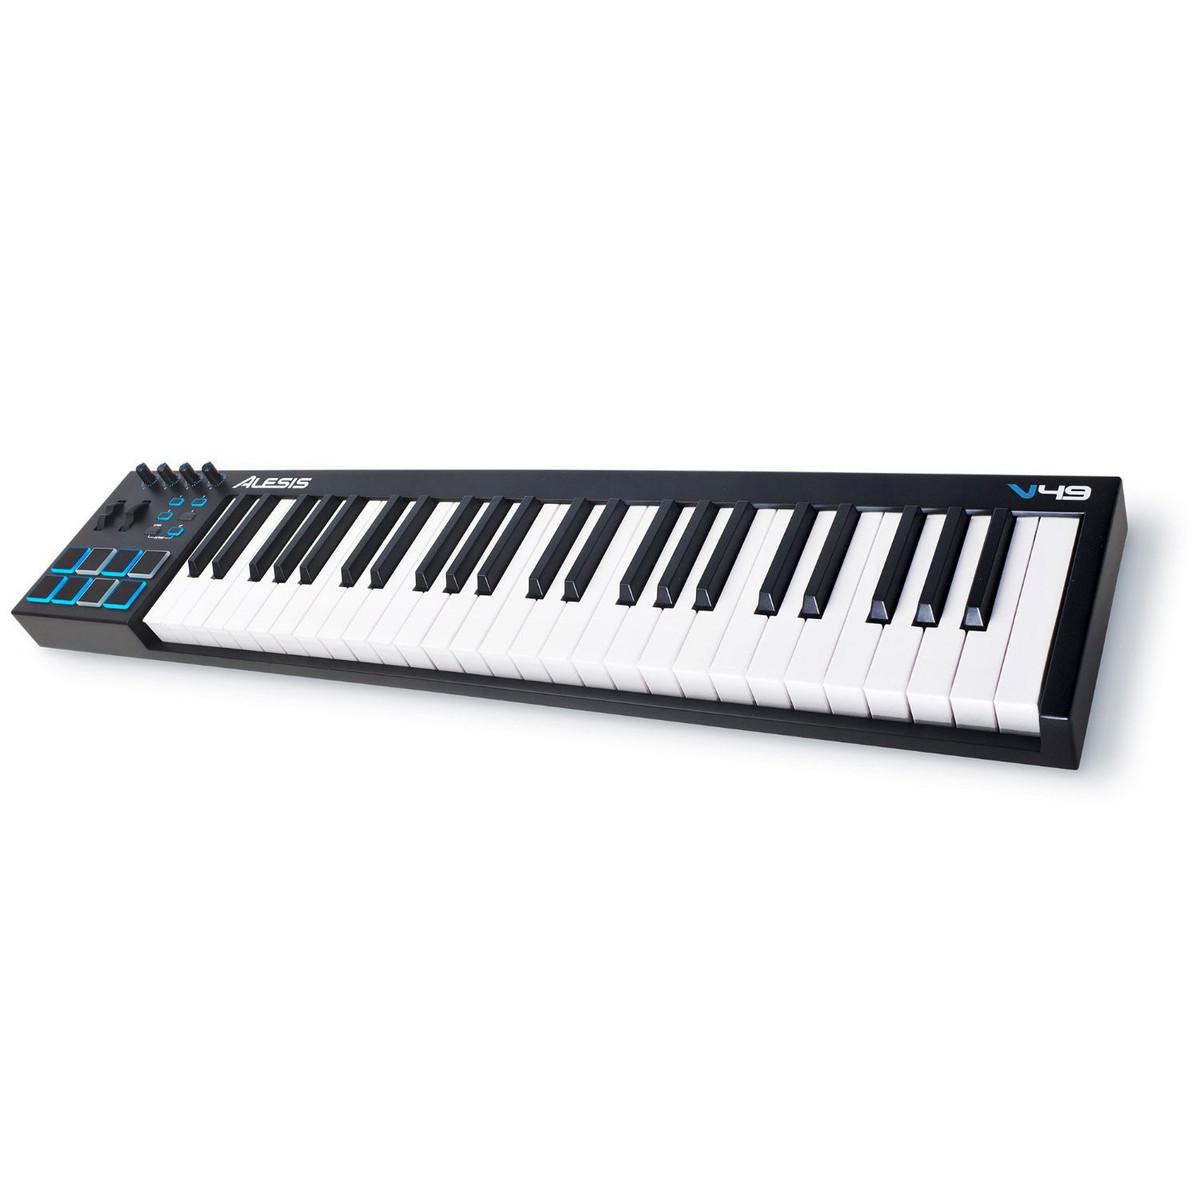 Image of Alesis V49 MIDI Keyboard Controller